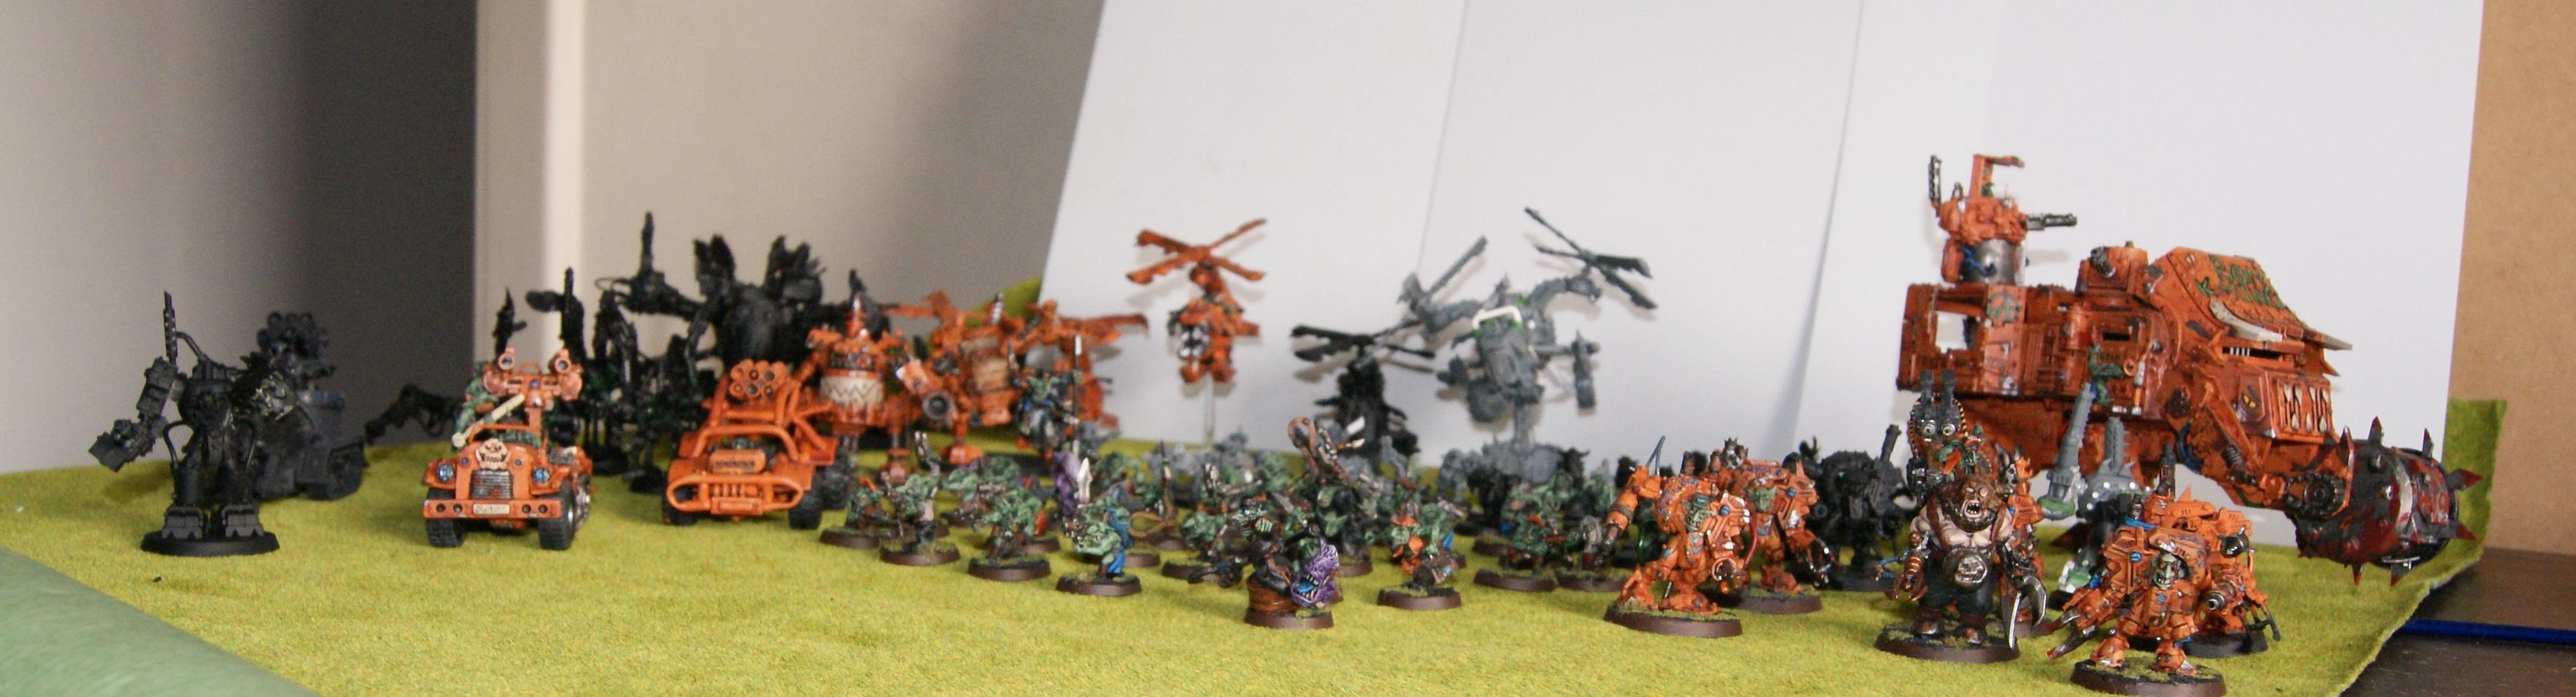 Conversion, Grot Rebellion, Grot Rebels, Grots, Group, Warhammer 40,000